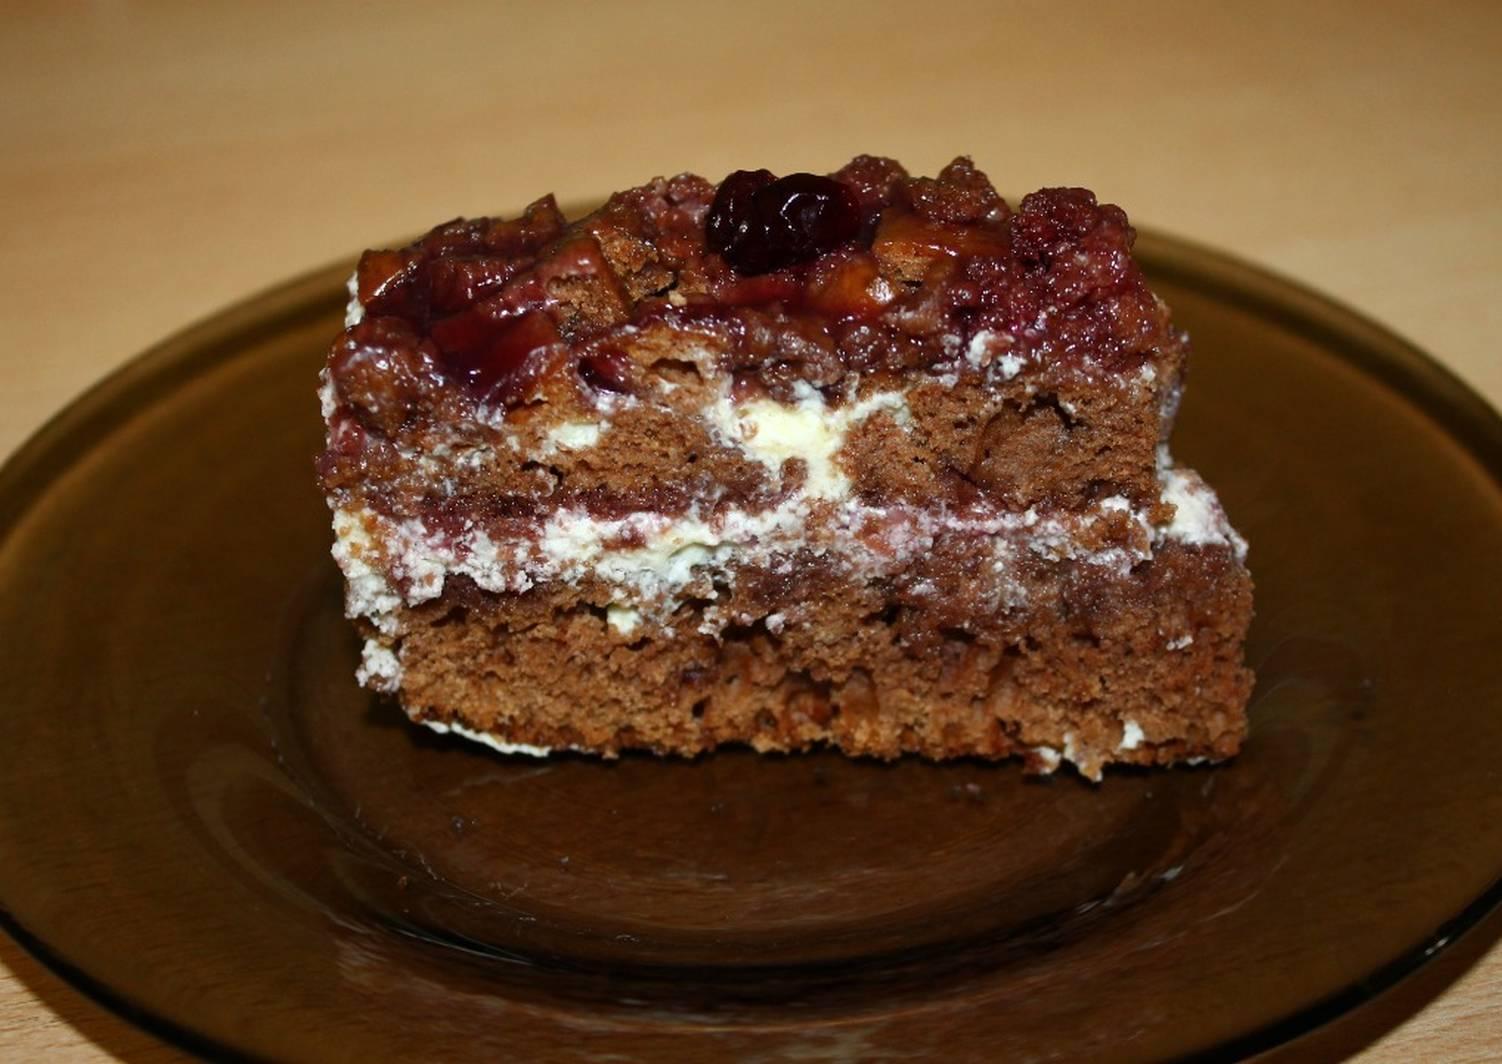 взгляд торт вишневый поцелуй рецепт с фото фотоаппарата металлический корпус